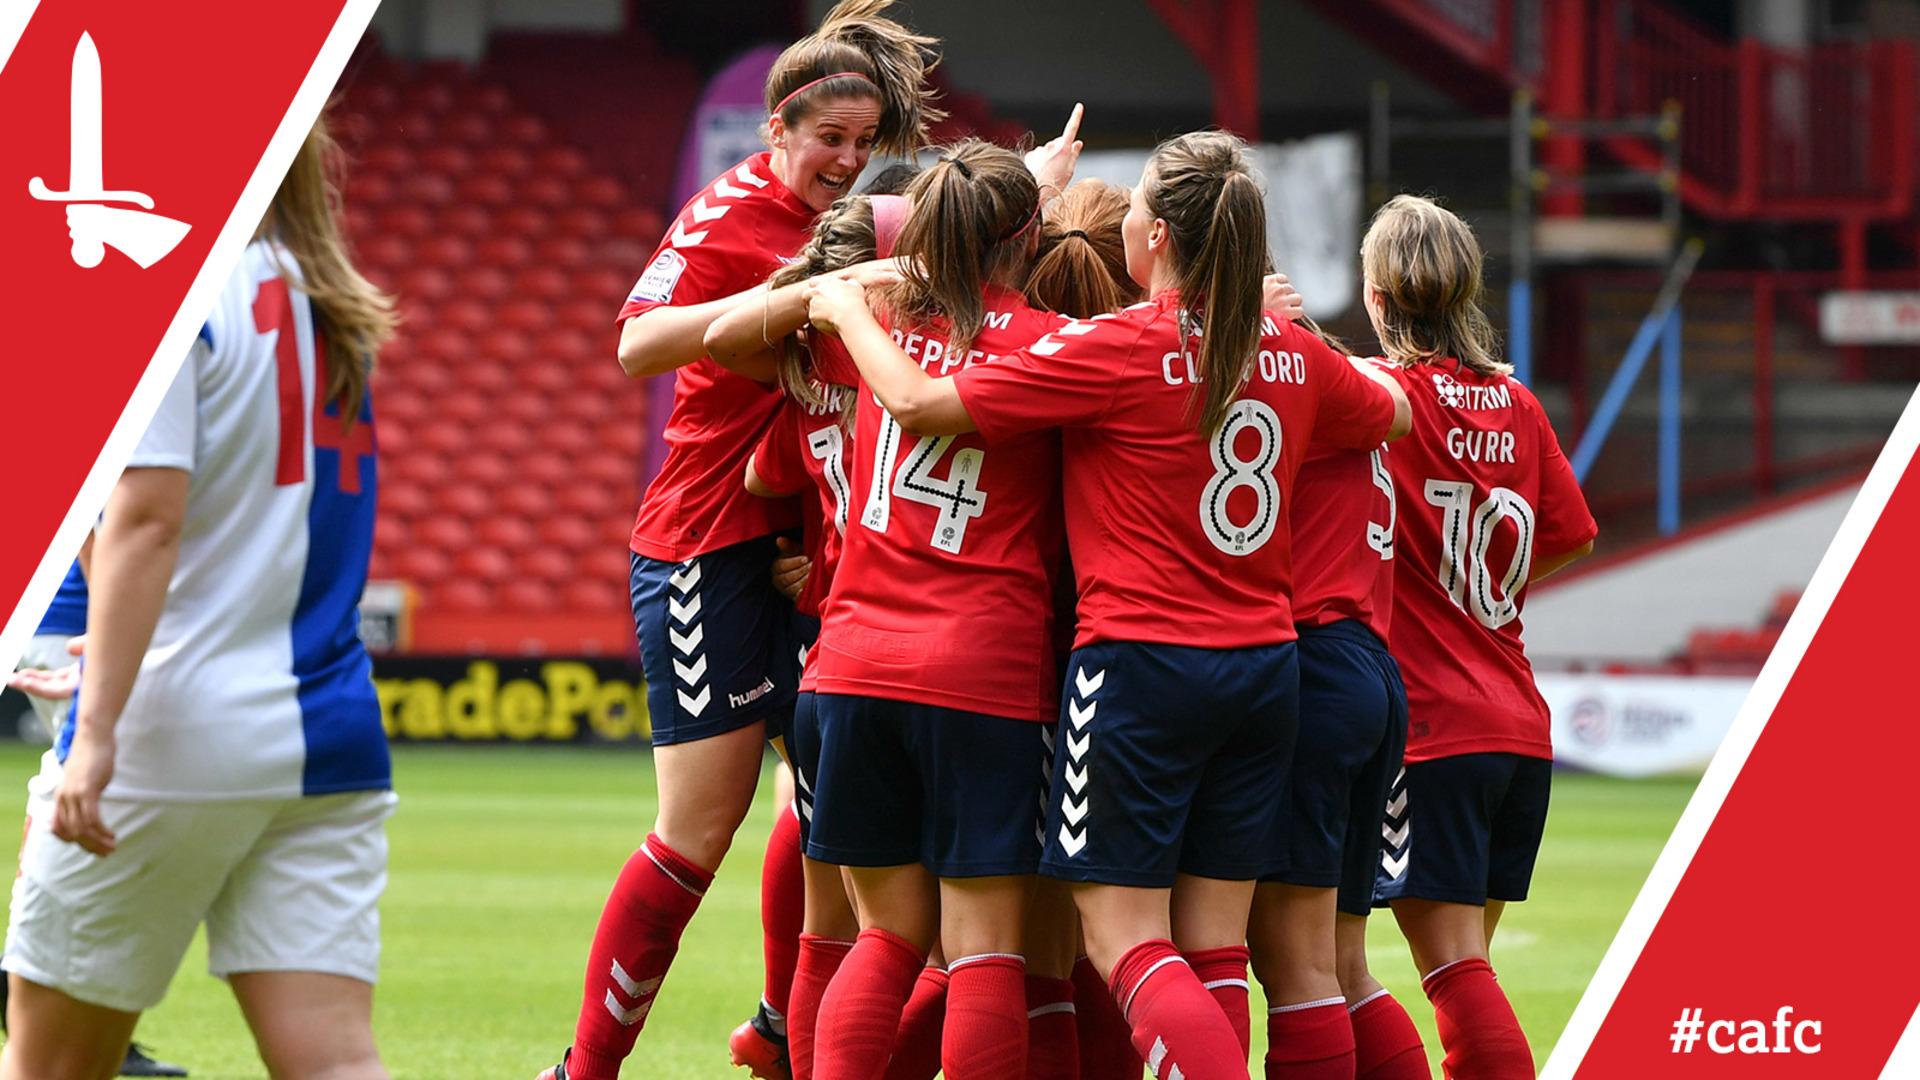 FULL GAME | Blackburn Ladies 1 Charlton Women 2 (May 2018)